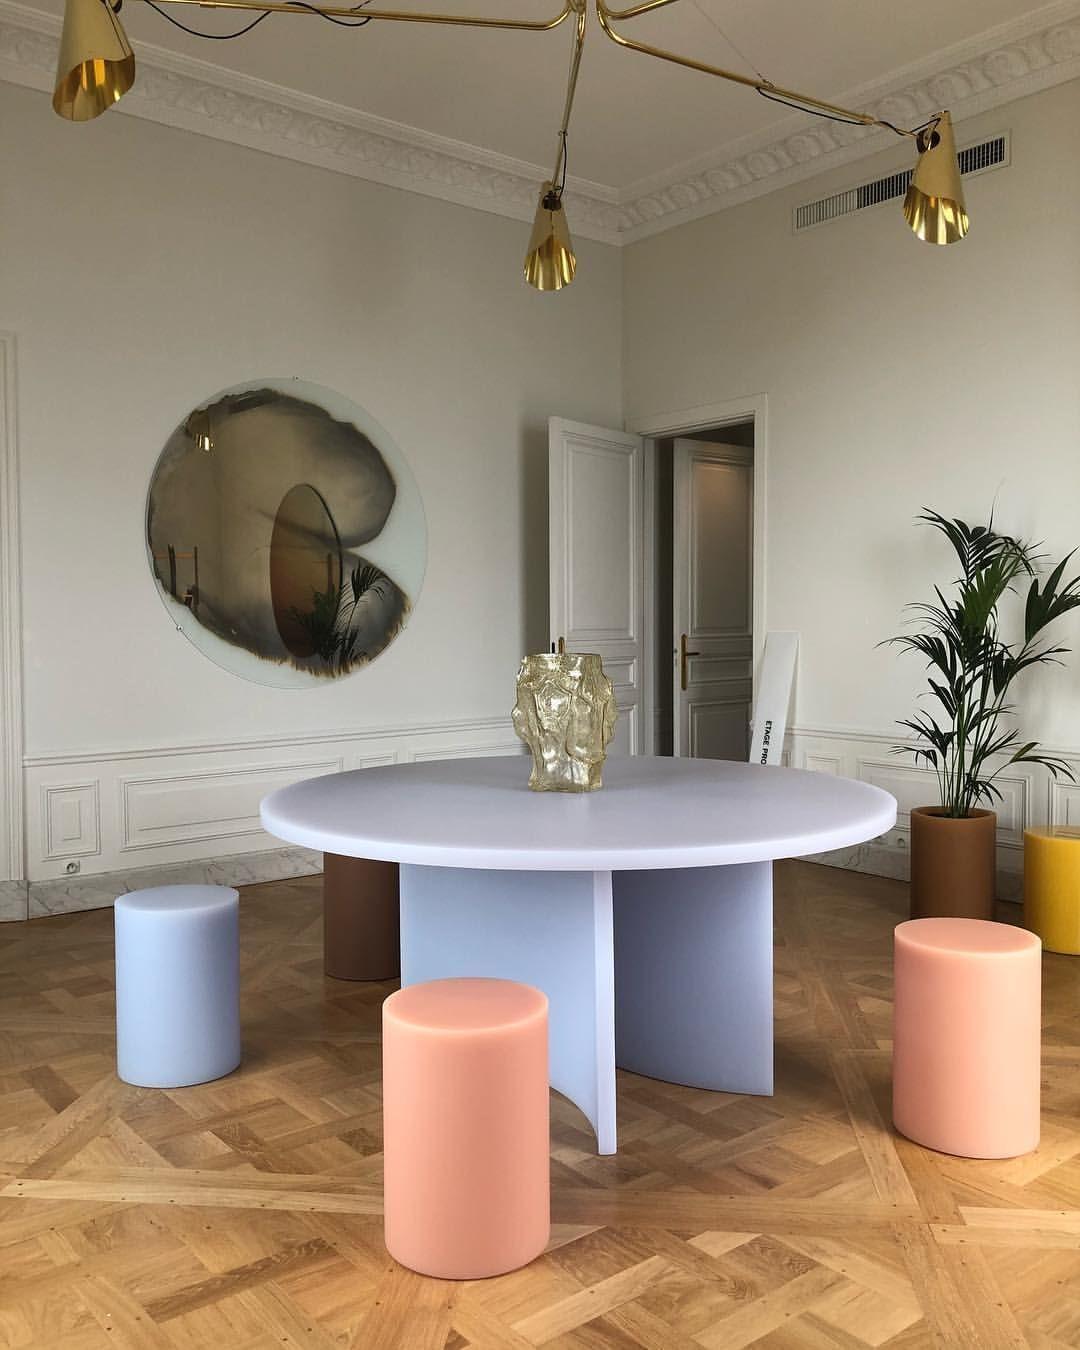 Etonnant Miraculous Cool Ideas: Modern Home Decor Decoration Home Decor Kmart  Pendant Lights.Home Decor Diy Art Home Decor Bathroom Gray.Home Decor  Kitchen Wall.